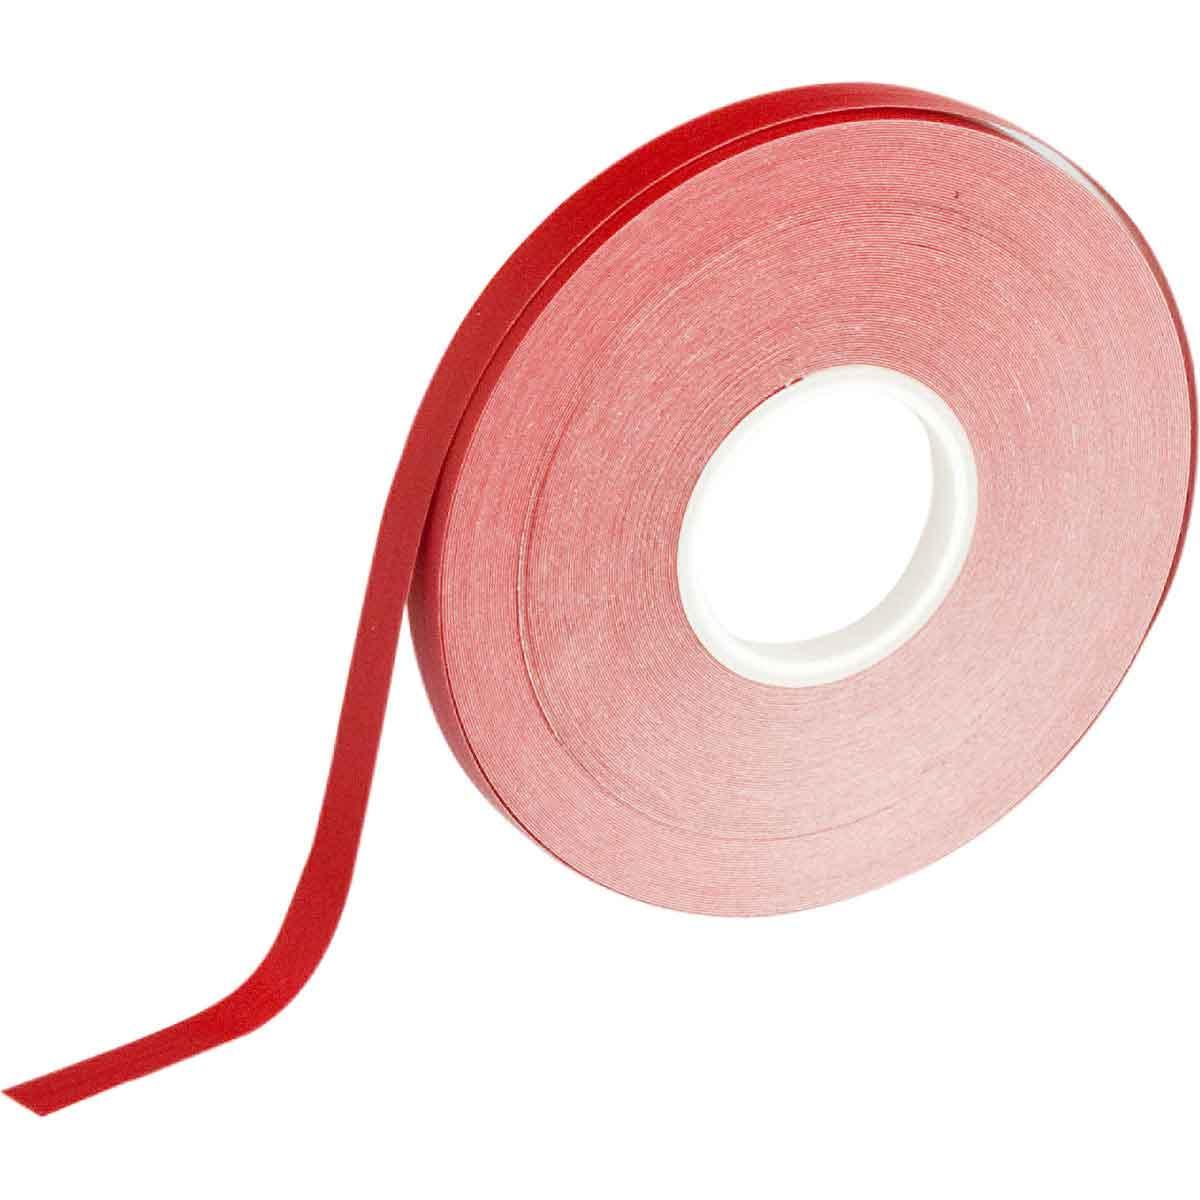 Brady® 121122 Non-Reflective Border Line Tape, 50 ft L x 1/4 in W, Red, B-7569 Vinyl Film